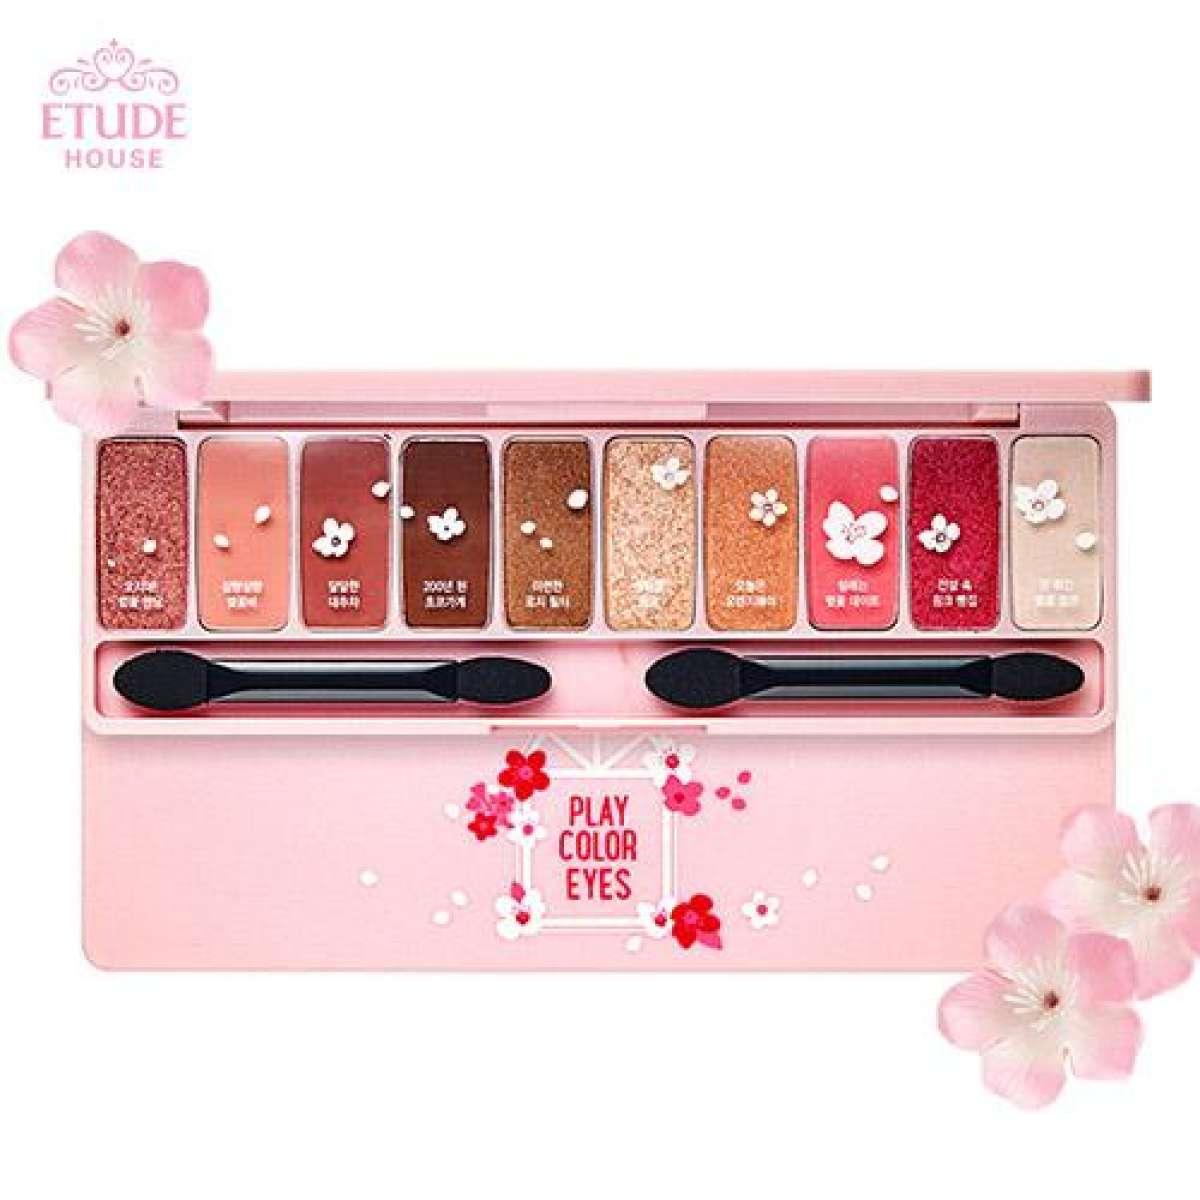 Bảng phấn mắt 10 màu Etude House Play Color Eyes Cherry Blossom